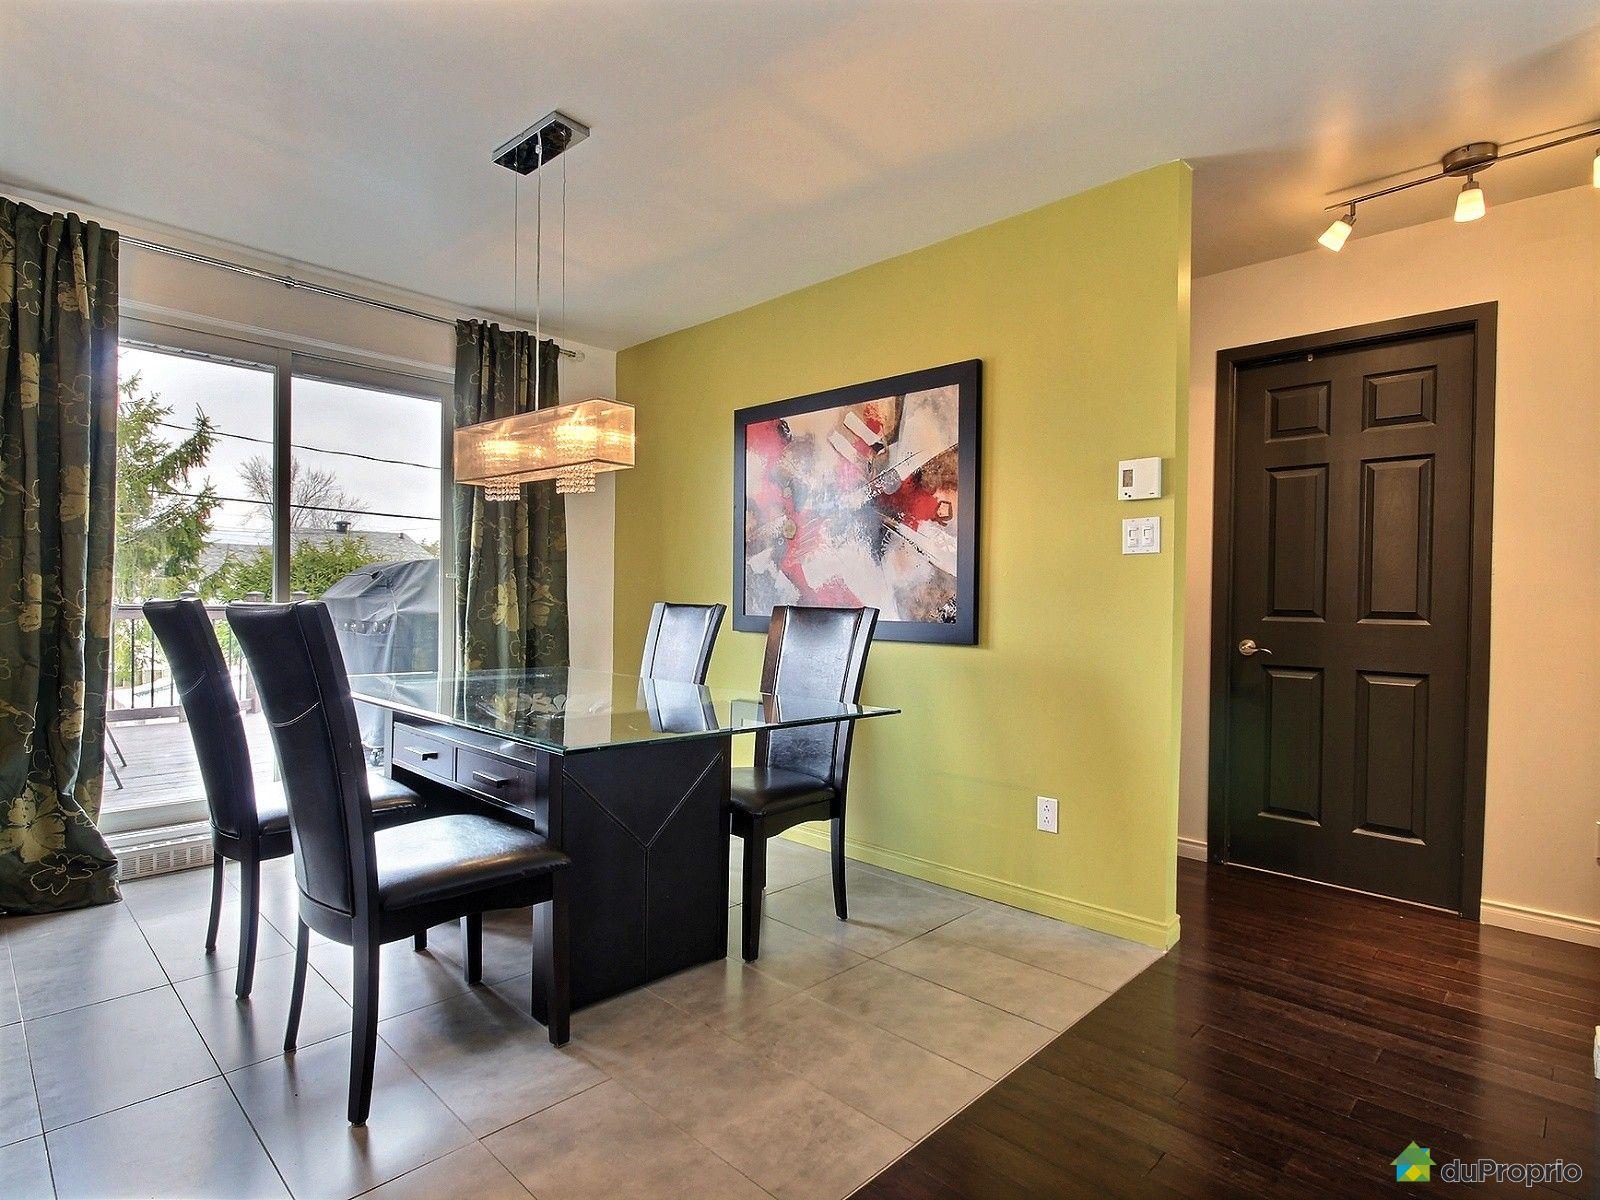 Maison vendre st jean chrysostome 919 rue pellan immobilier qu bec duproprio 700403 for Salle a manger jean